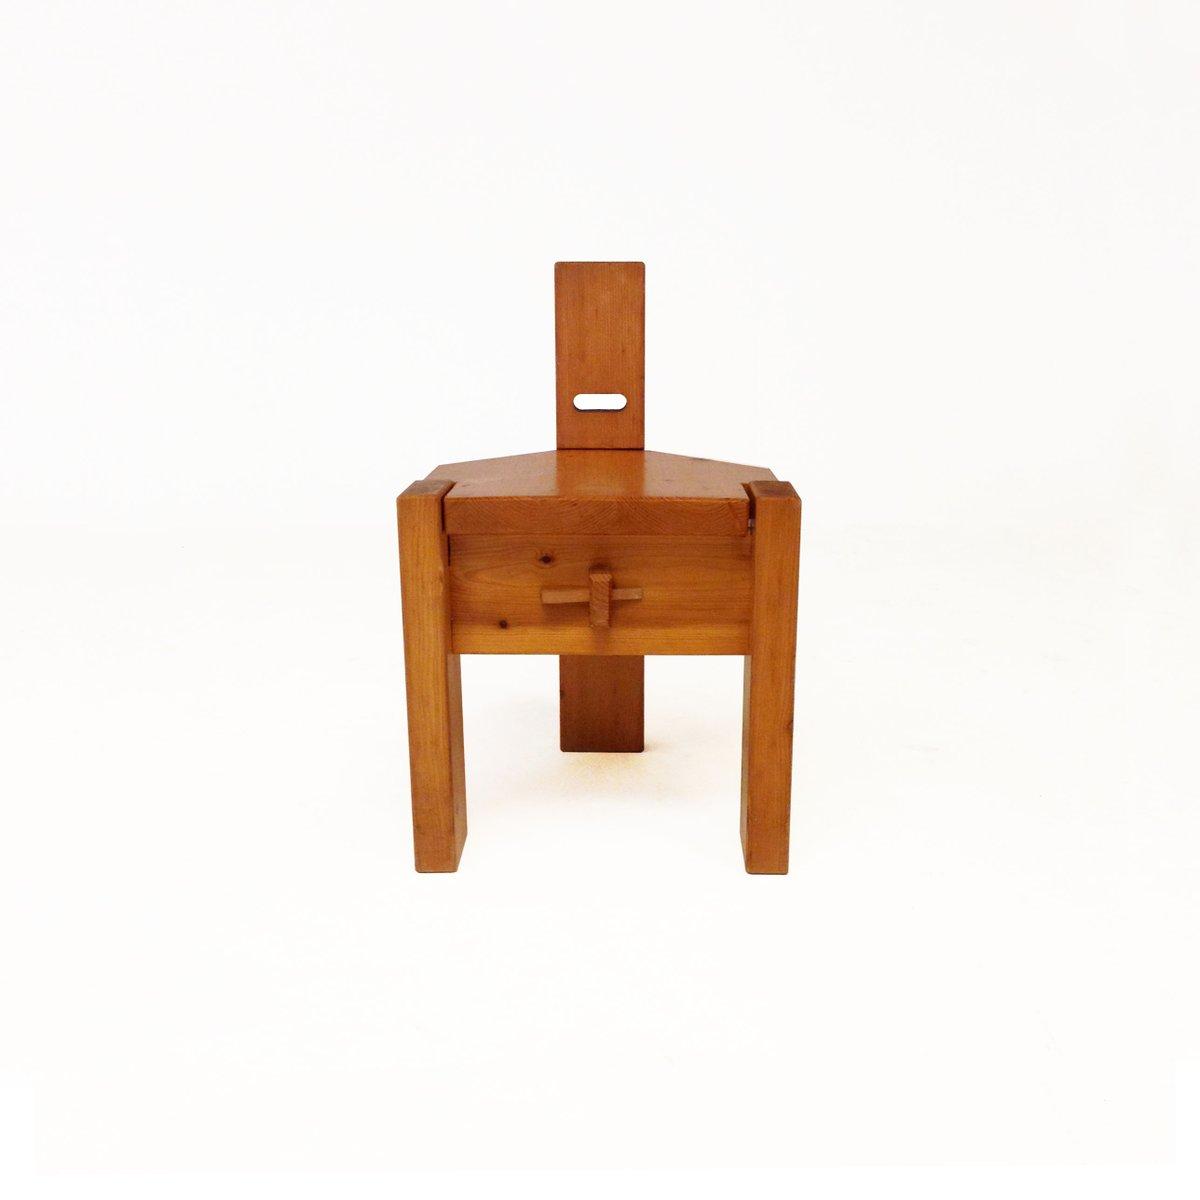 Kinderstuhl von Erwin Egel für Nürnberg-Moorenbrunn, Dieter Güllert, 1... | Kinderzimmer > Kinderzimmerstühle > Kinderstühle | Braun | Kiefernholz